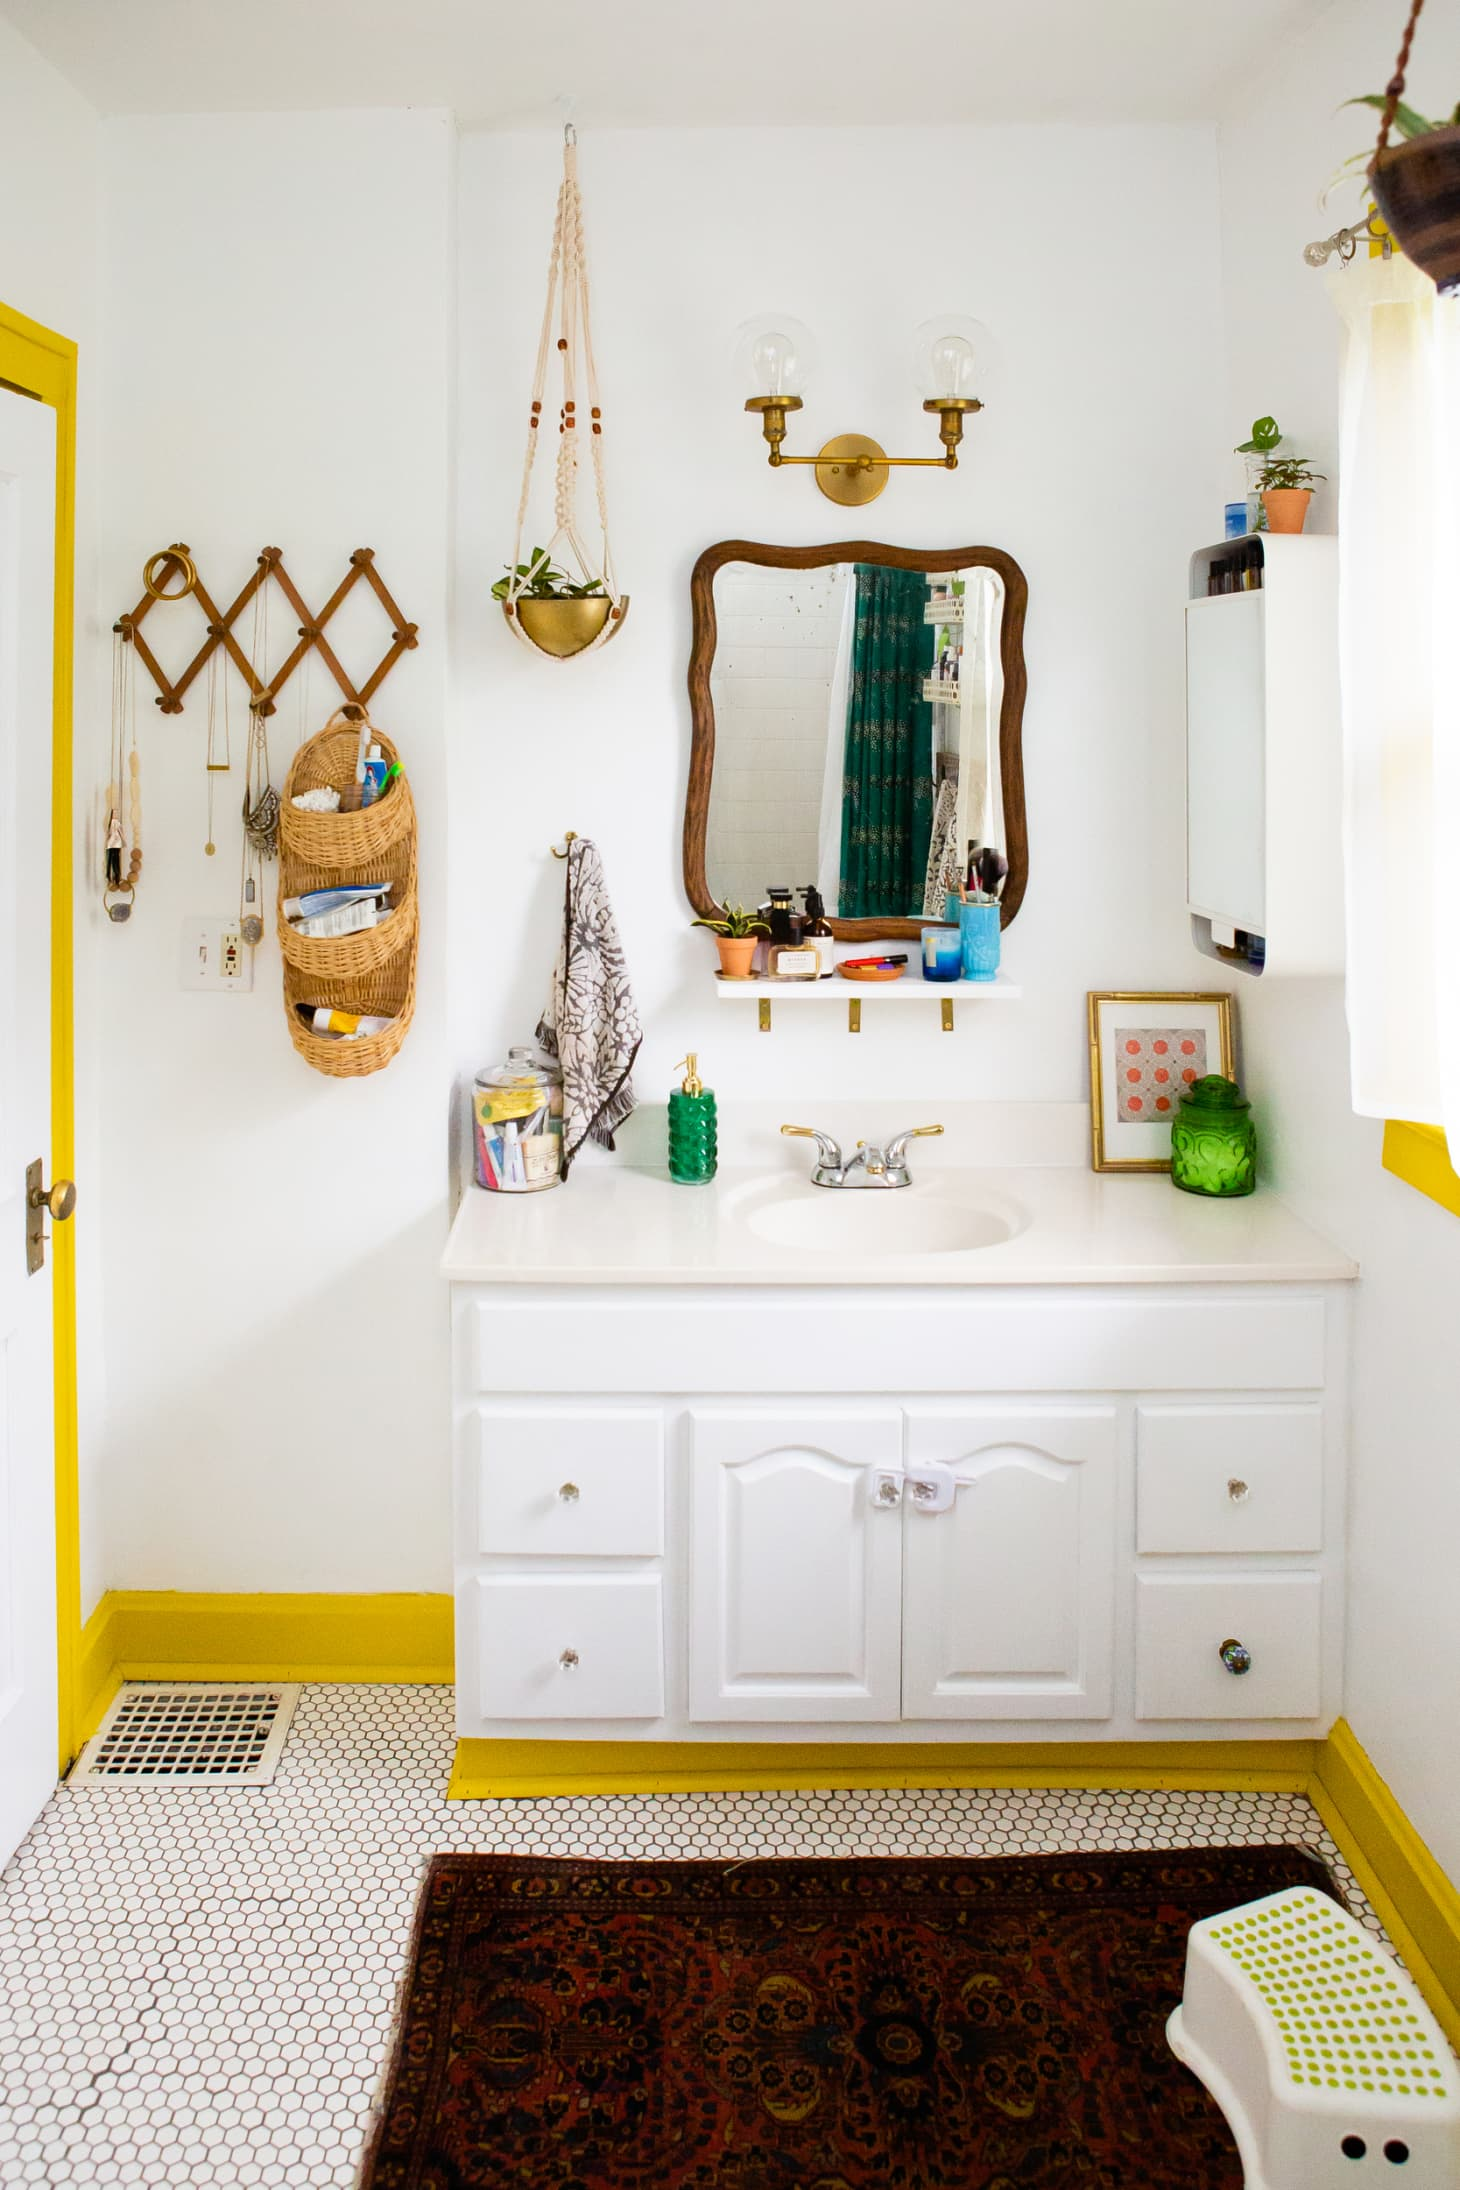 50 Best Small Bathroom Decorating Ideas - Tiny Bathroom ... on Small Apartment Bathroom  id=30559